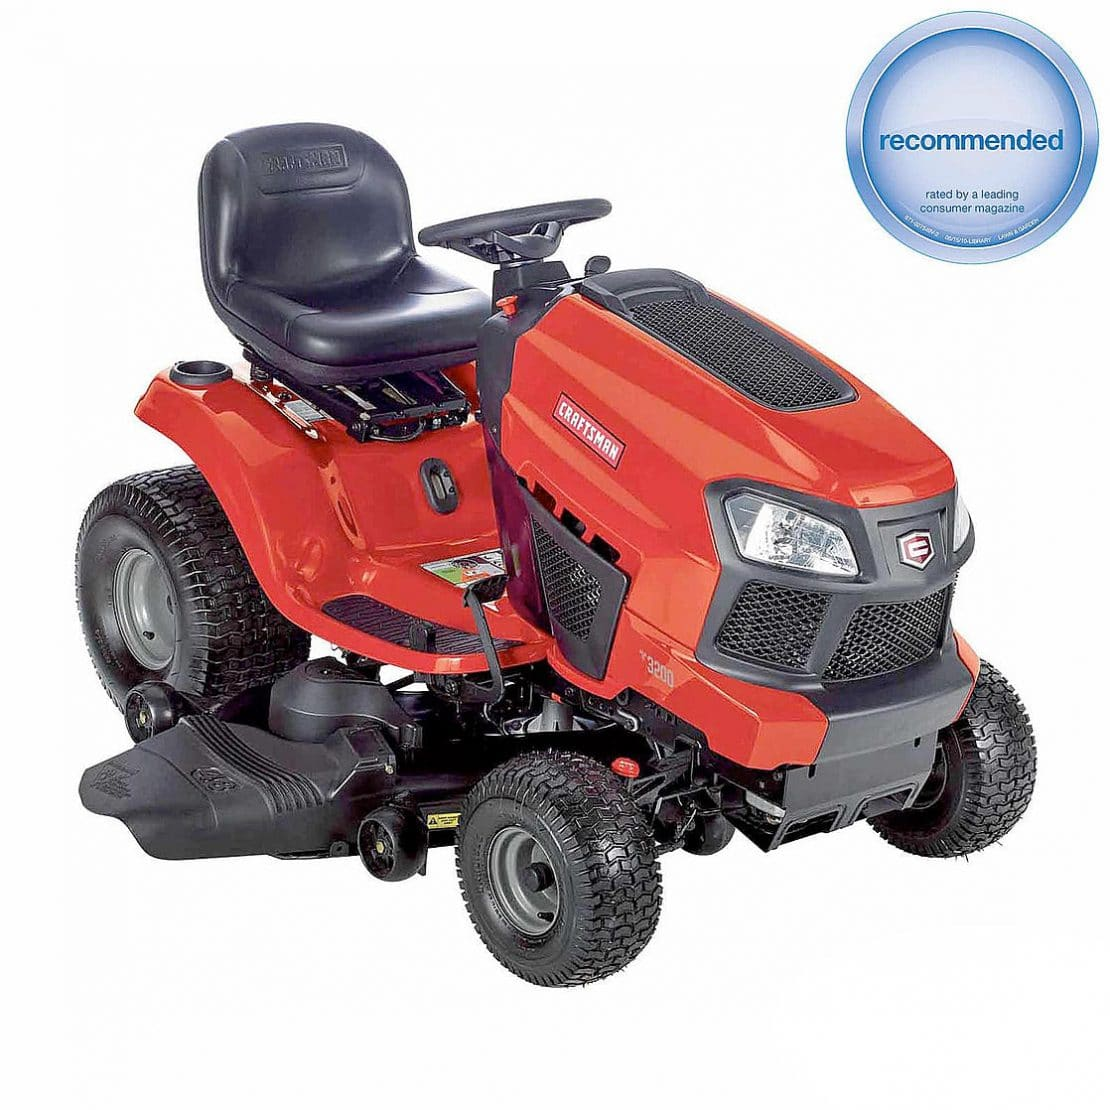 Craftsman 3500 Riding Mower : Craftsman in hp yt hydro model yard